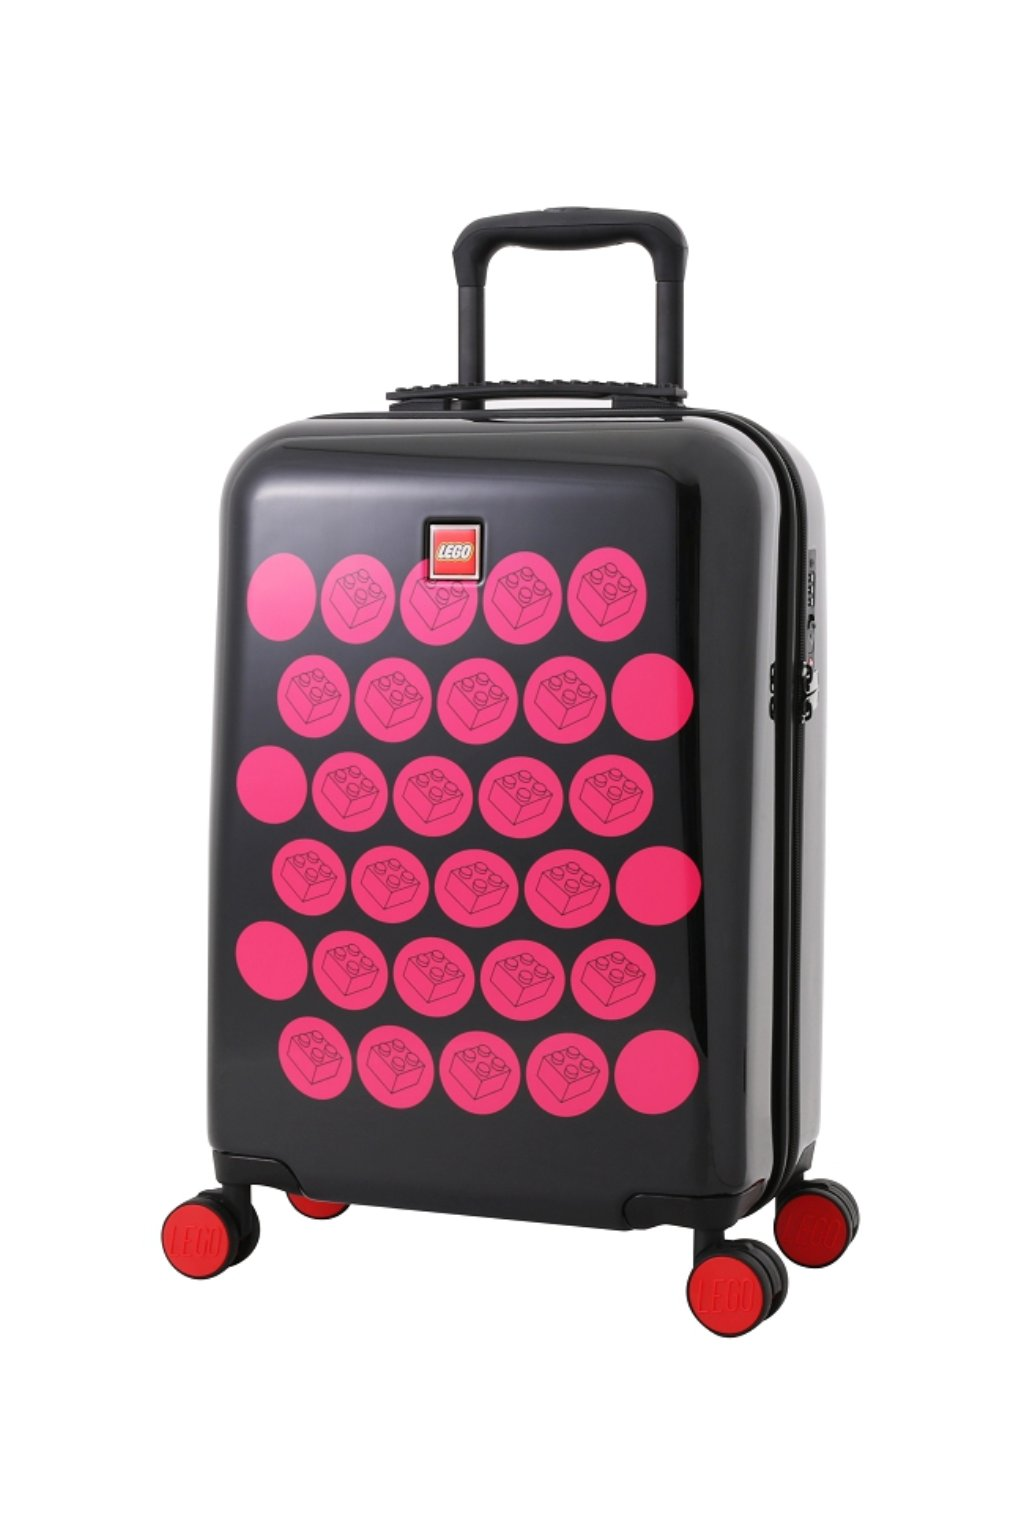 kufrland lego colourbox brickdots black:pink s 5